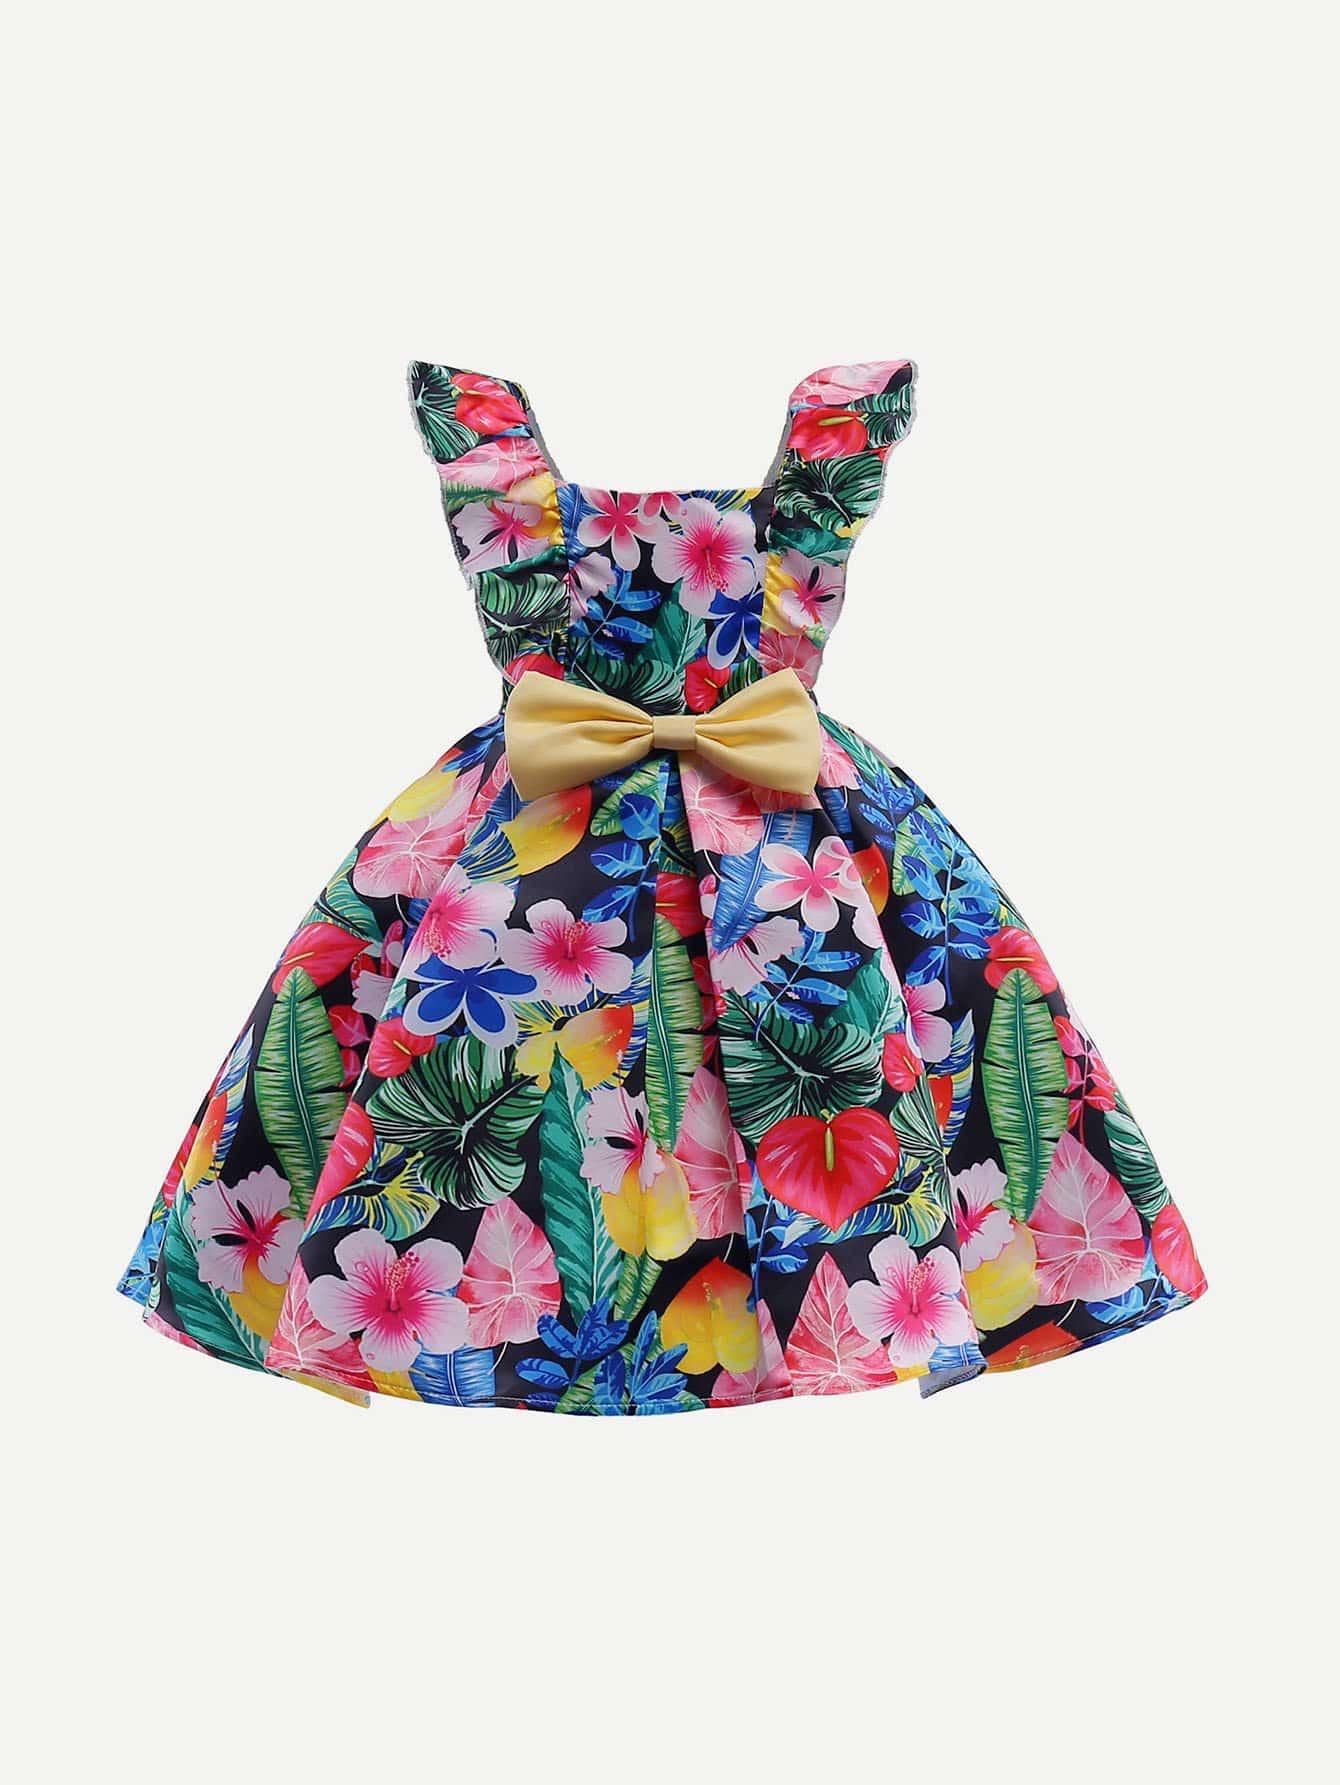 Girls Jungle Print Ruffle Trim Bow Tie Dress